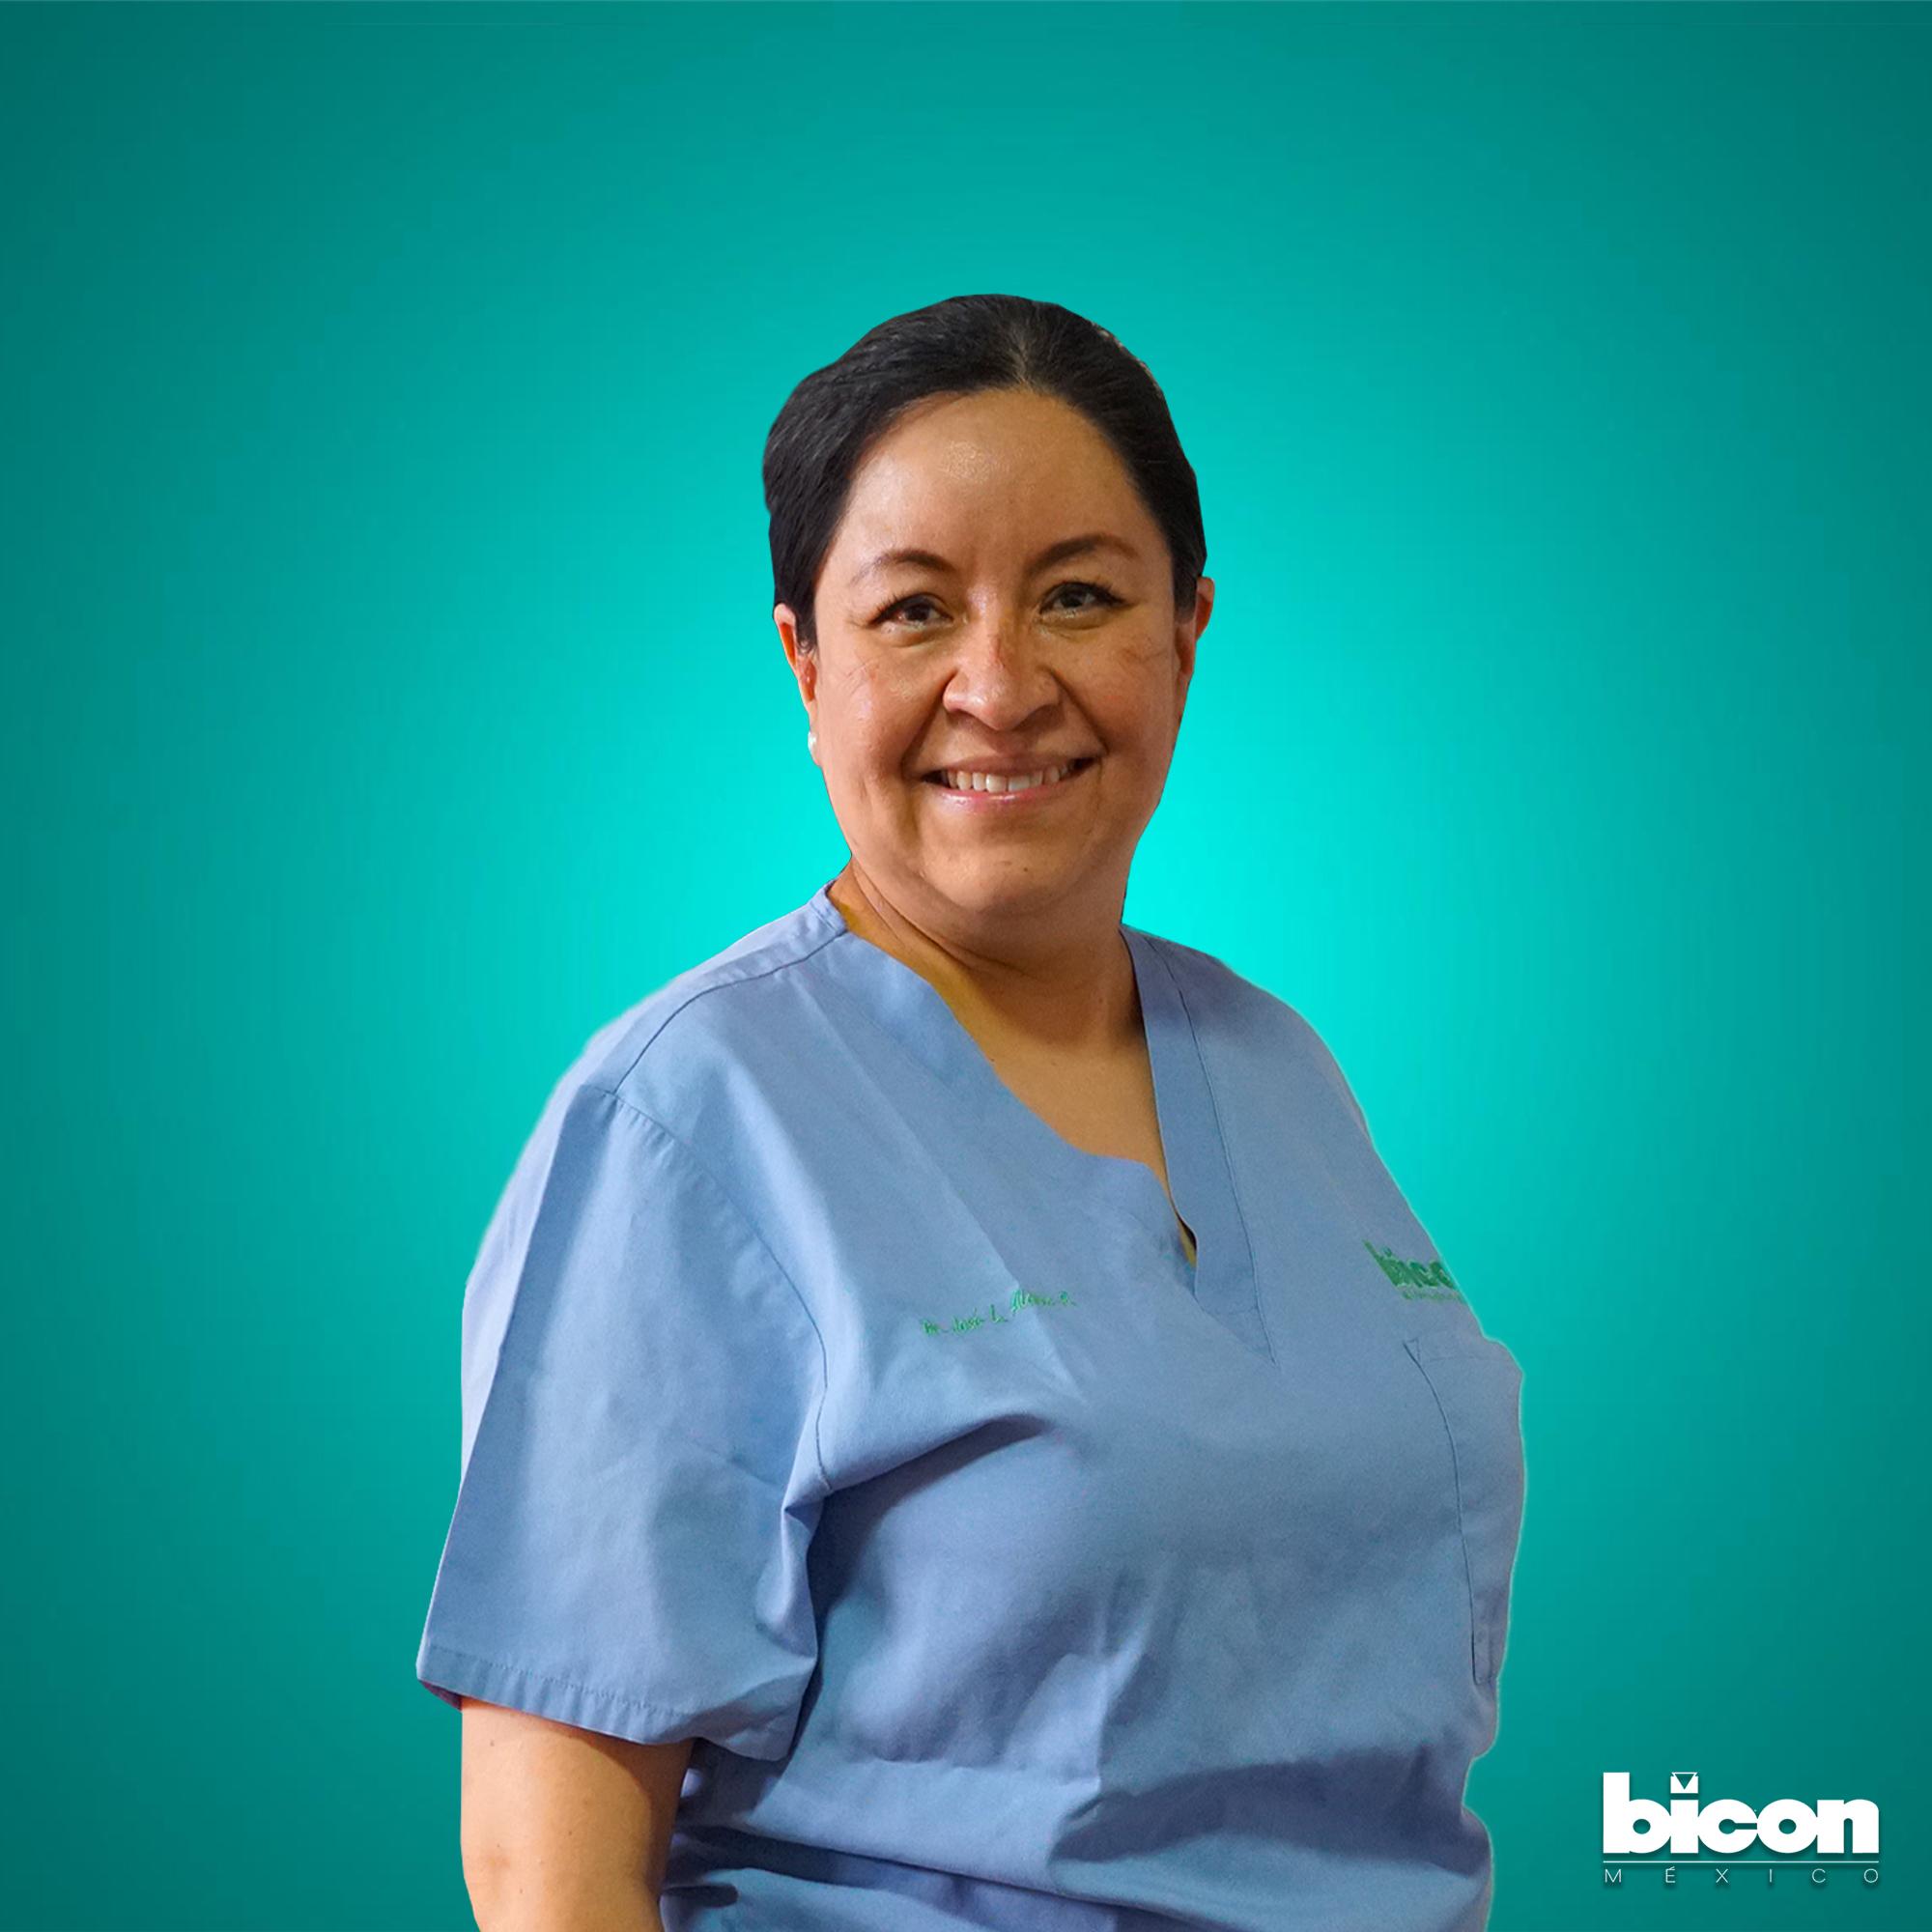 https://mexicoimplantdentistry.com/wp-content/uploads/2021/04/Ma.-del-Carmen-Rodriguez-Cervera.jpg